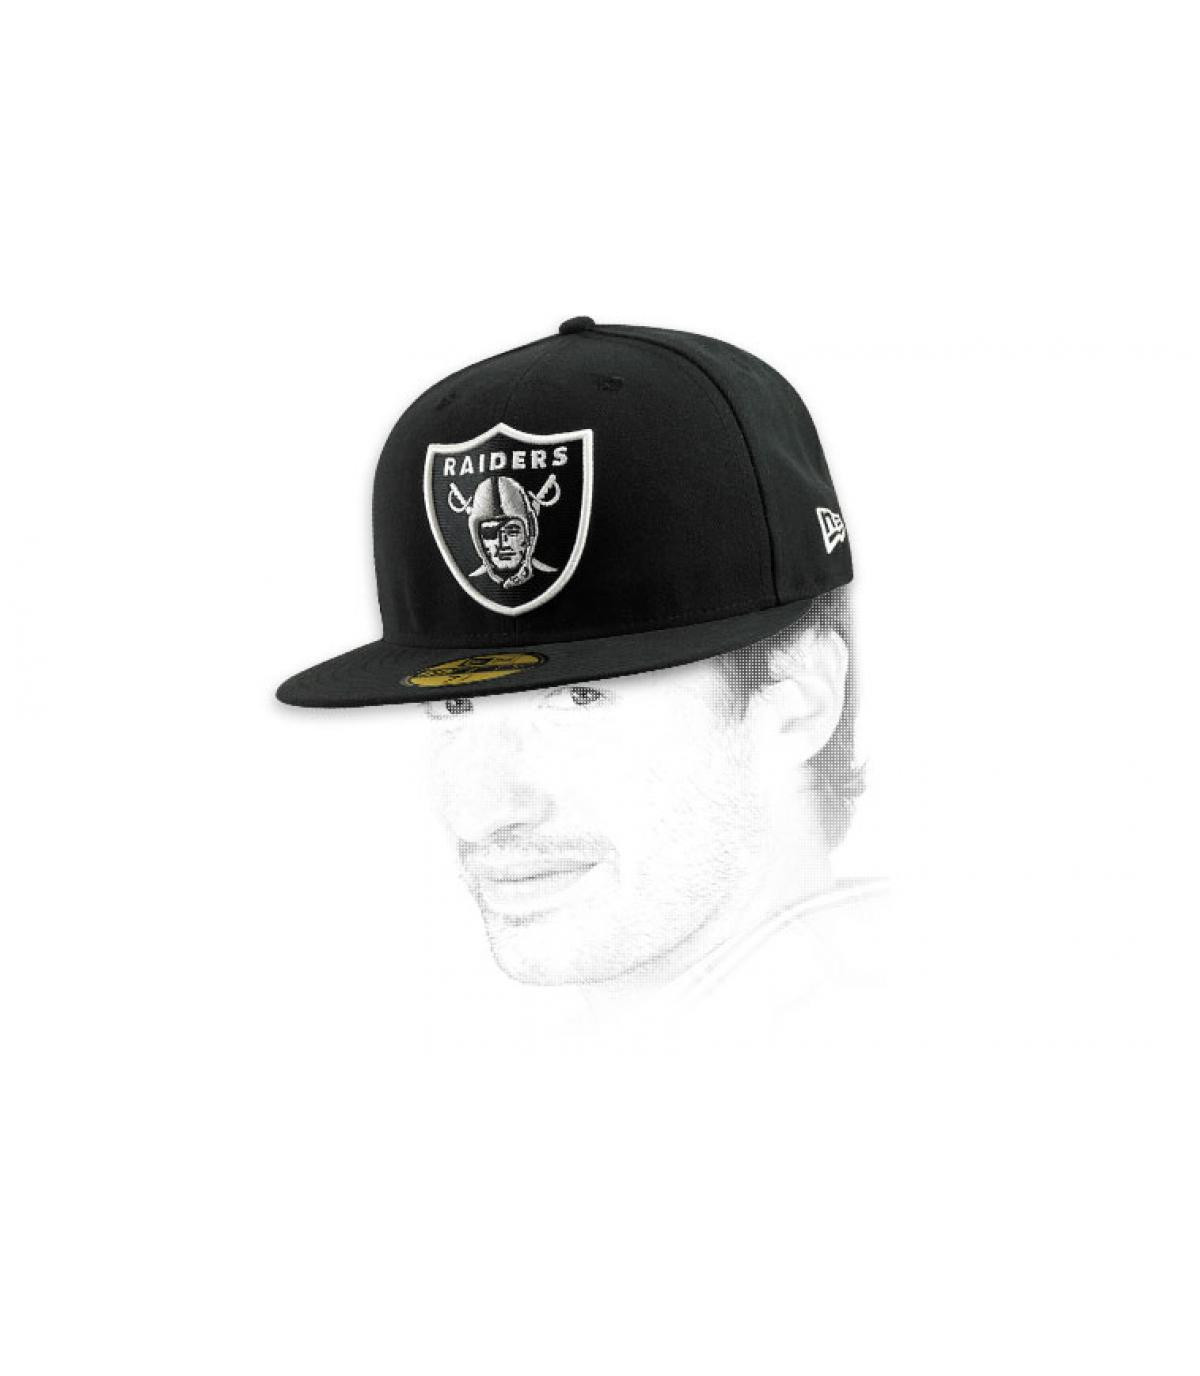 Details Cap Raiders zwart - afbeeling 6